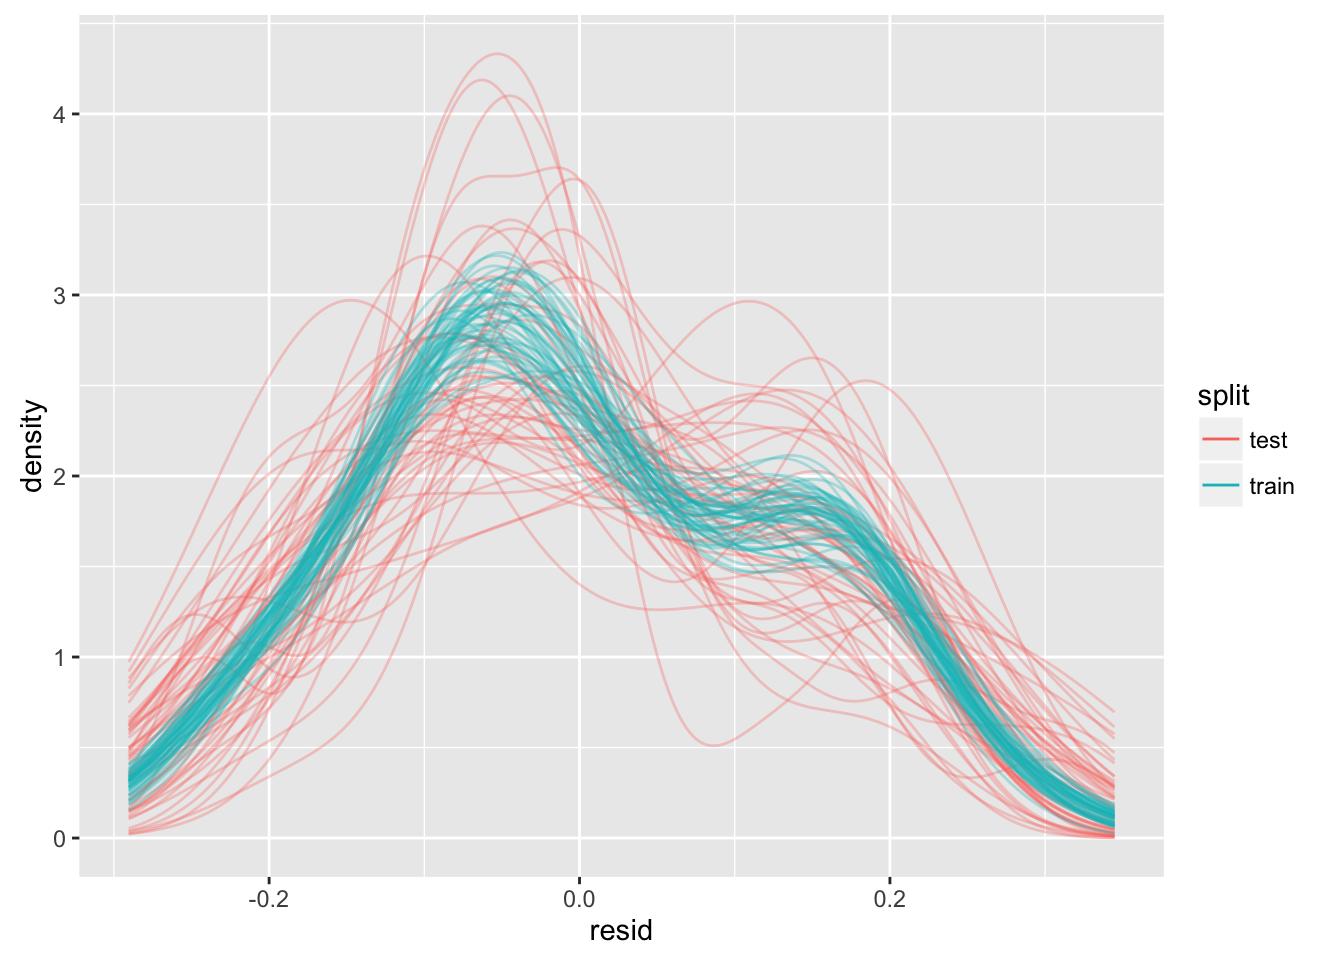 Model-selection using cross-validation